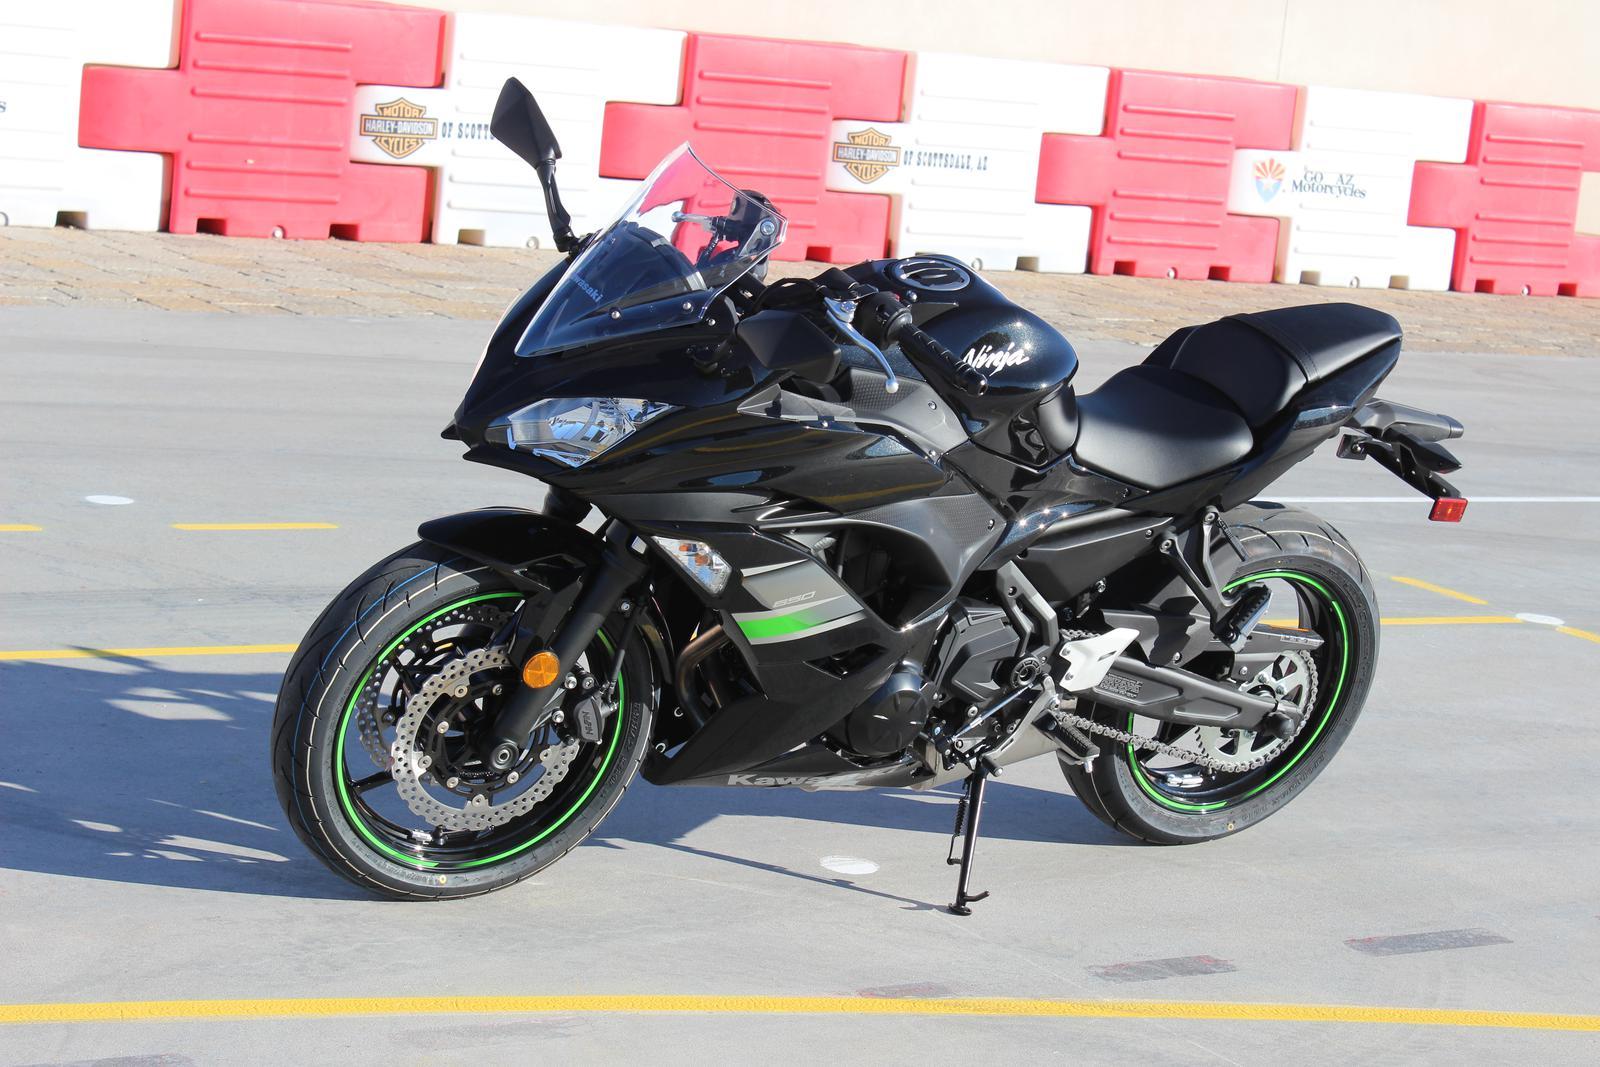 2019 Kawasaki Ninja 650 For Sale In Scottsdale Az Go Az